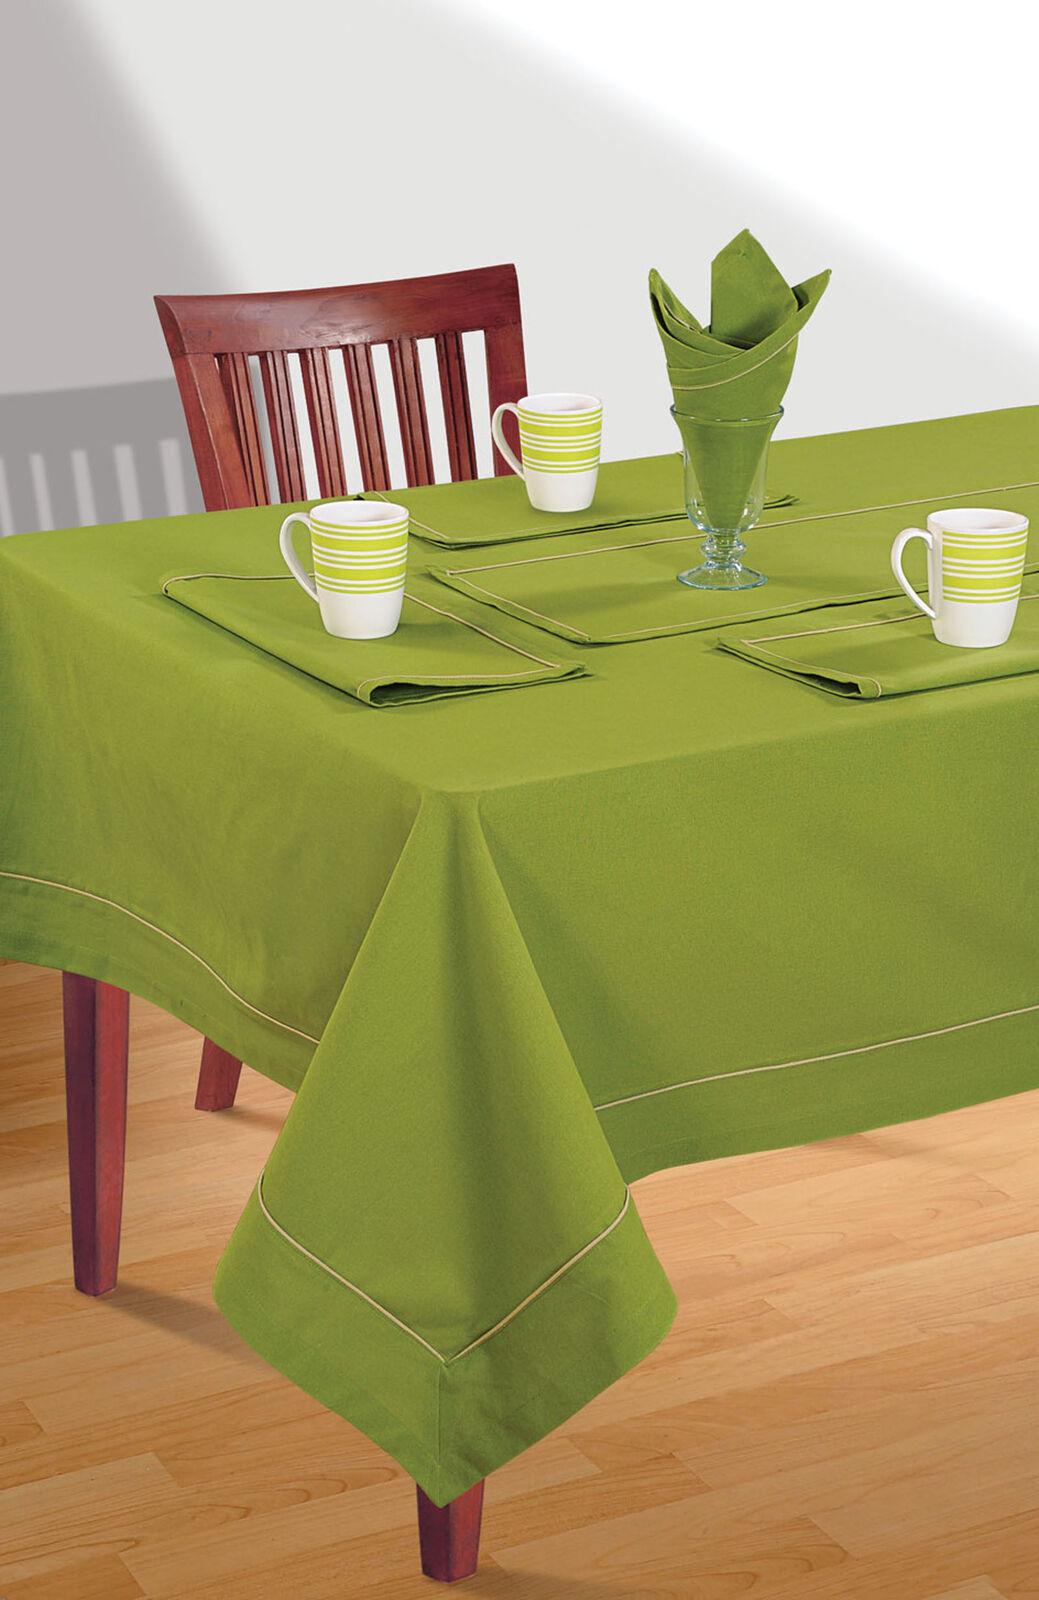 220 GSM, 100% Cotton Table Cover Grün Plain Table Cloth Lines- Größe Available